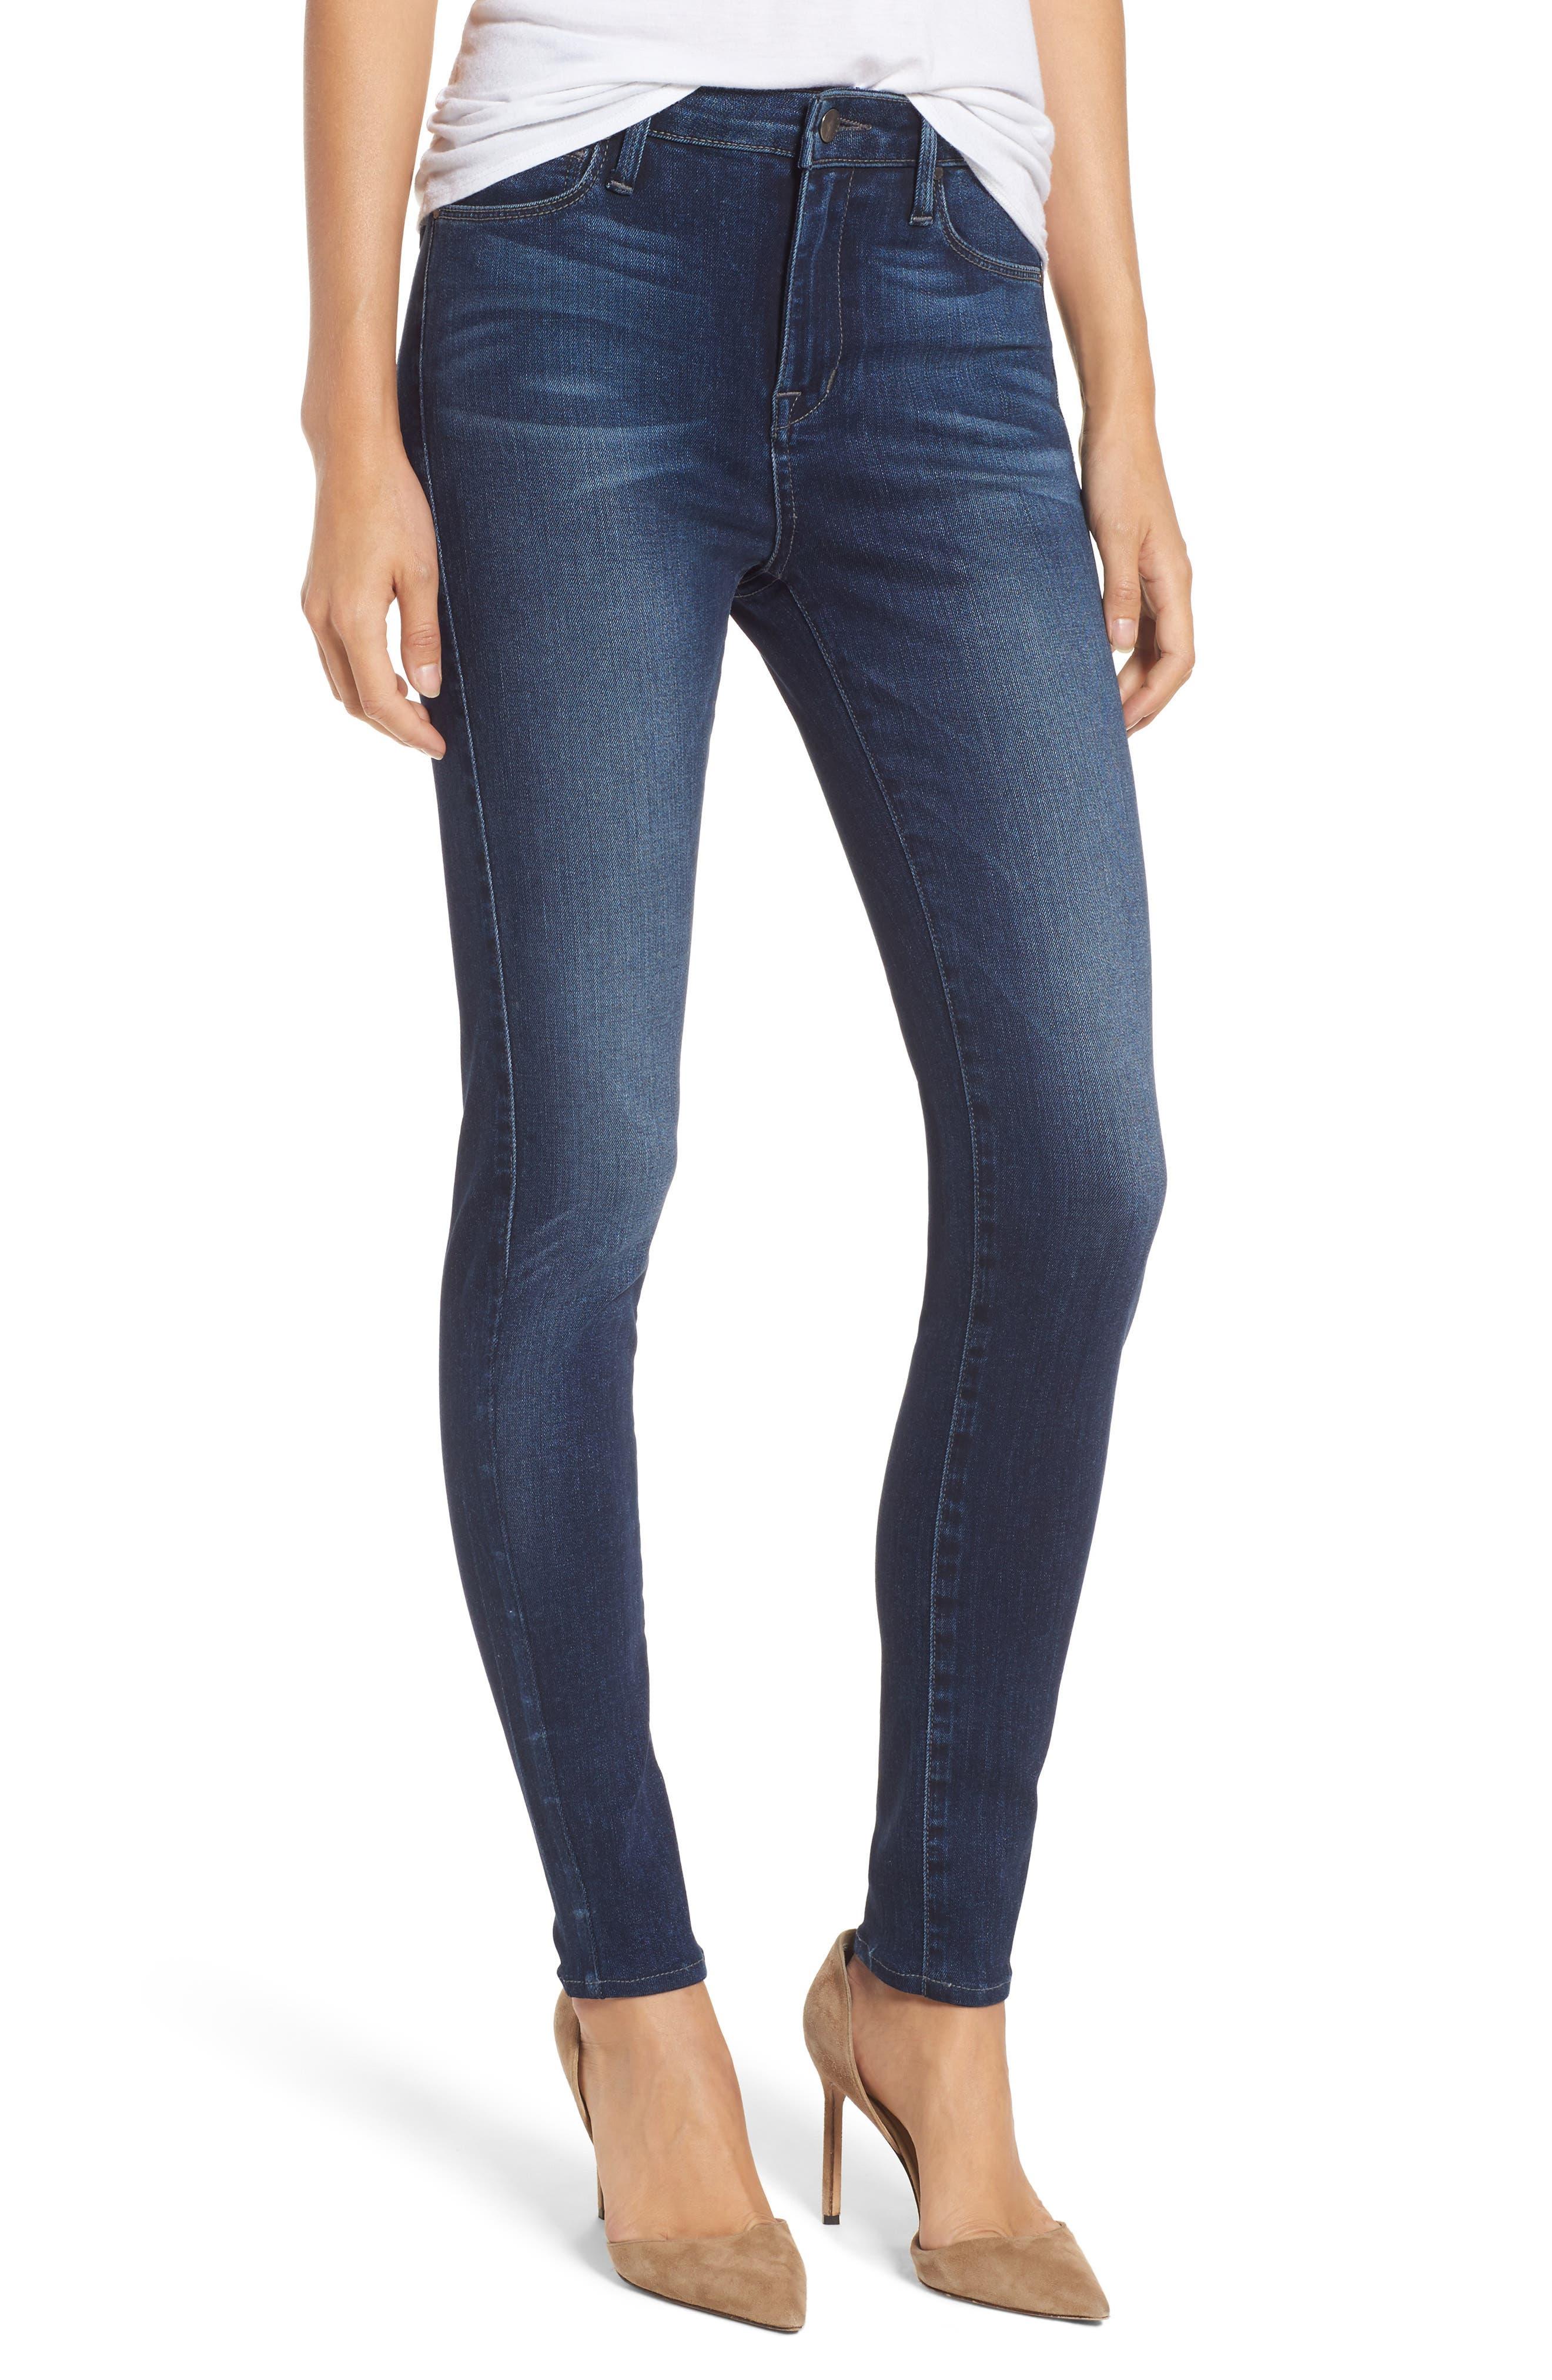 Fidelity Denim Gwen High Waist Skinny Jeans (Blue Suede)